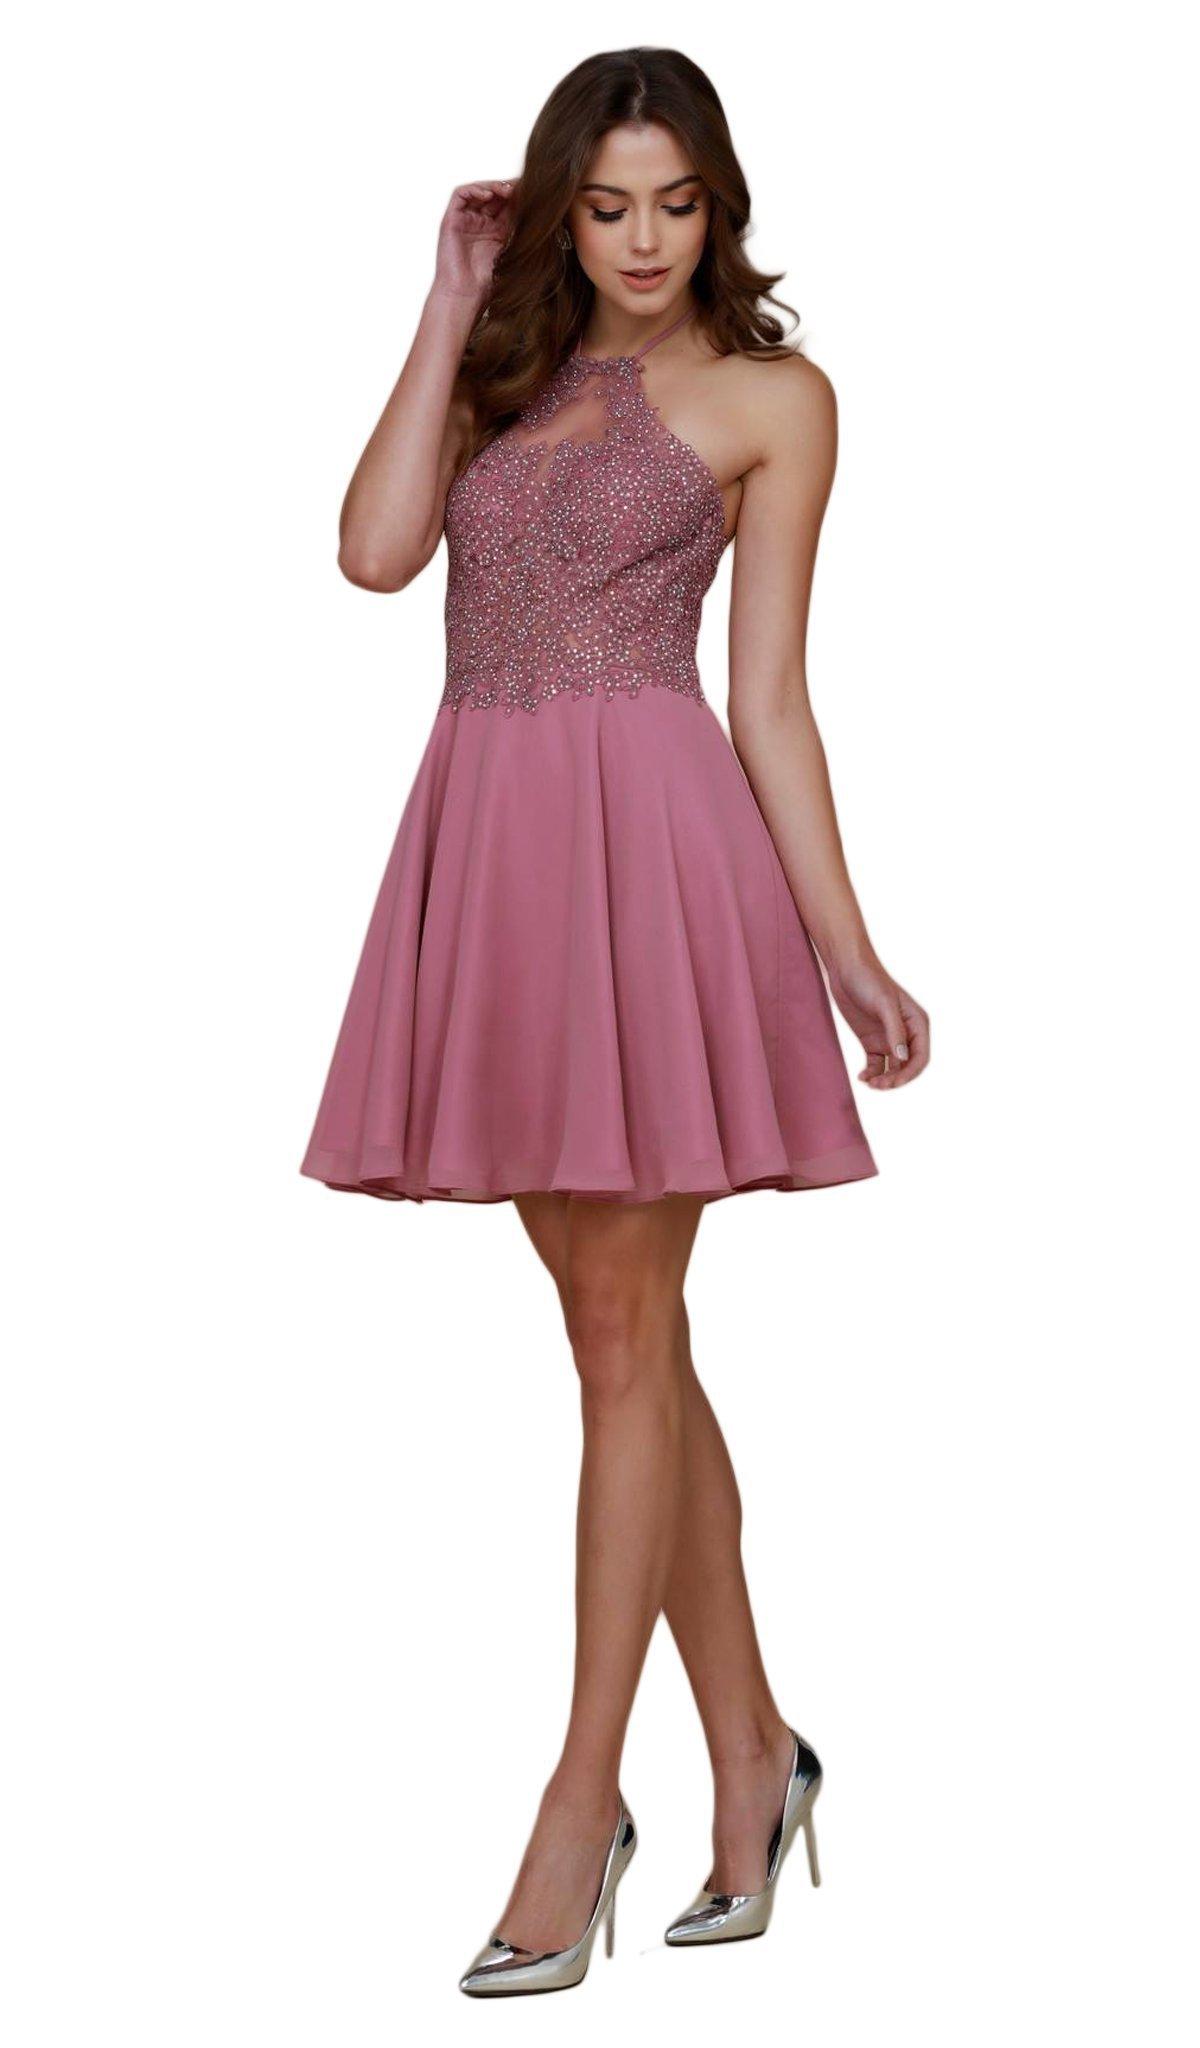 Nox Anabel - G657 Applique Halter Neck A-line Dress